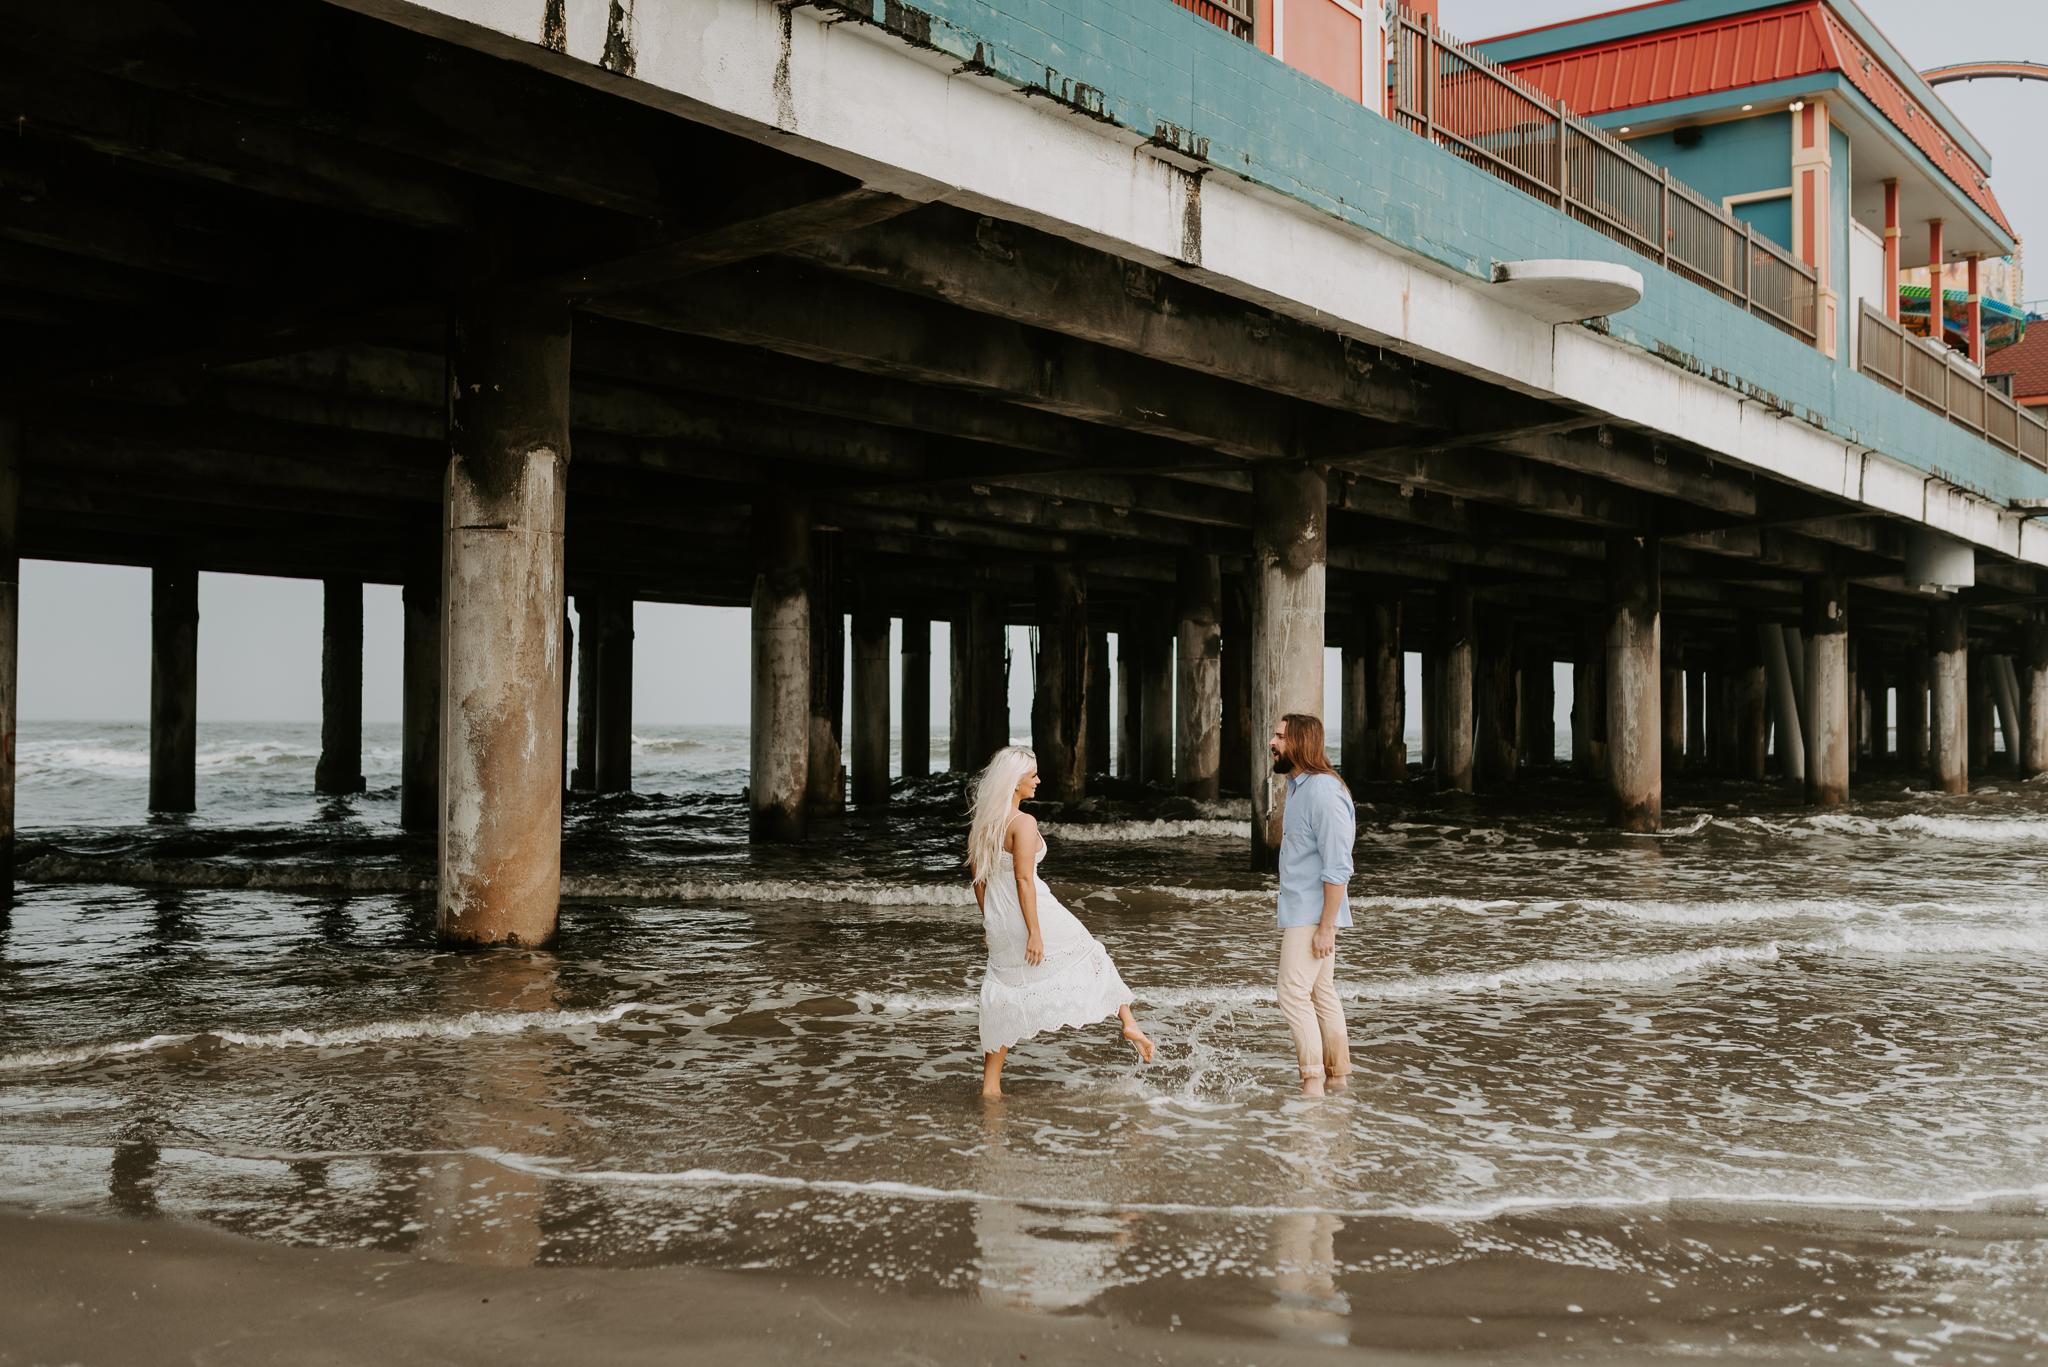 Ashley + Charles - Galveston Texas Moody Engagement Session | Kristen Giles Photography - 019.jpg